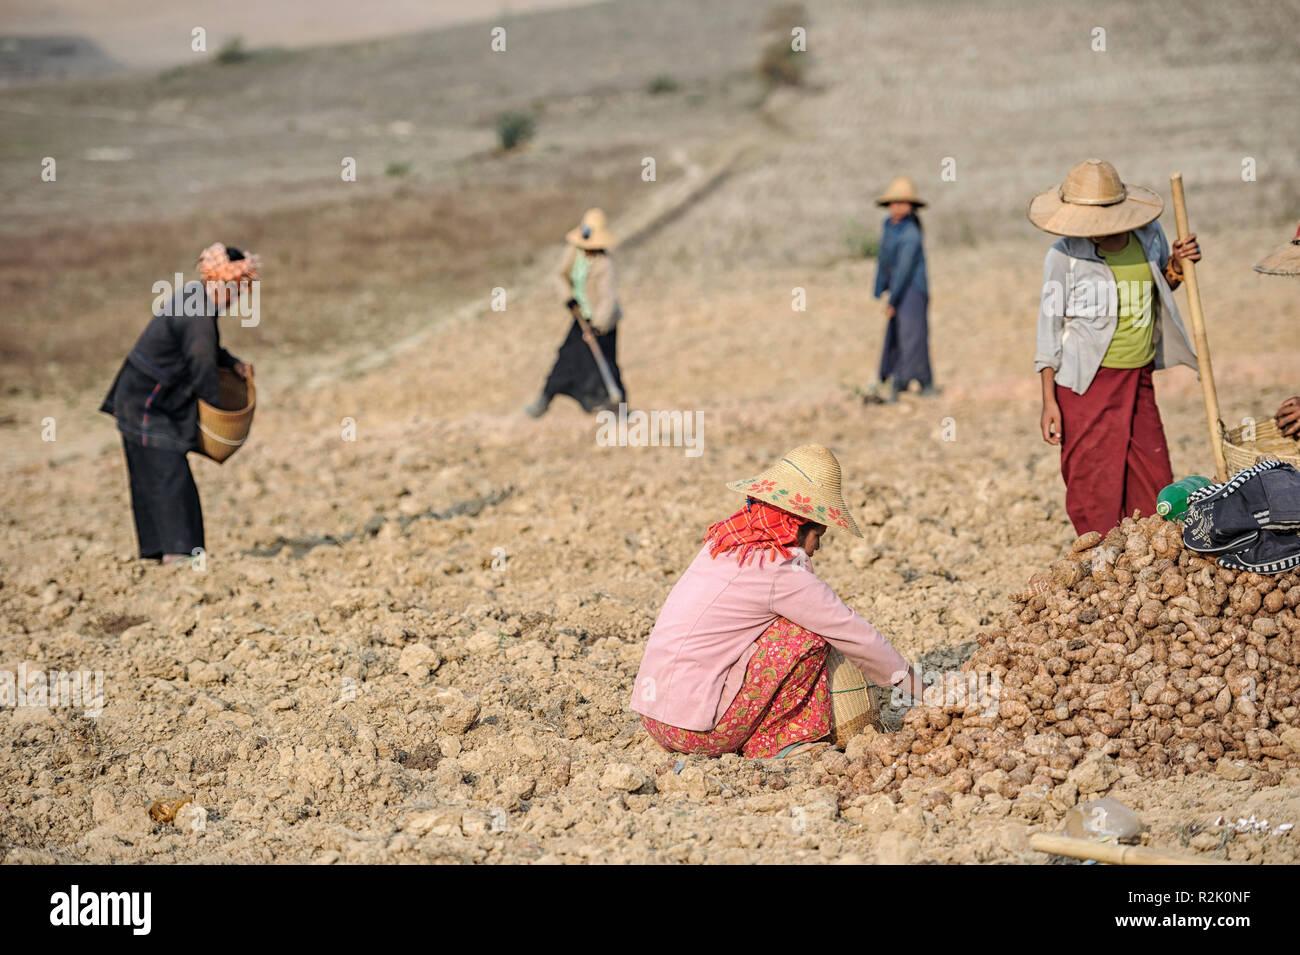 women-harvesting-taro-root-colocasia-esculenta-in-shan-state-myanmar-R2K0NF.jpg